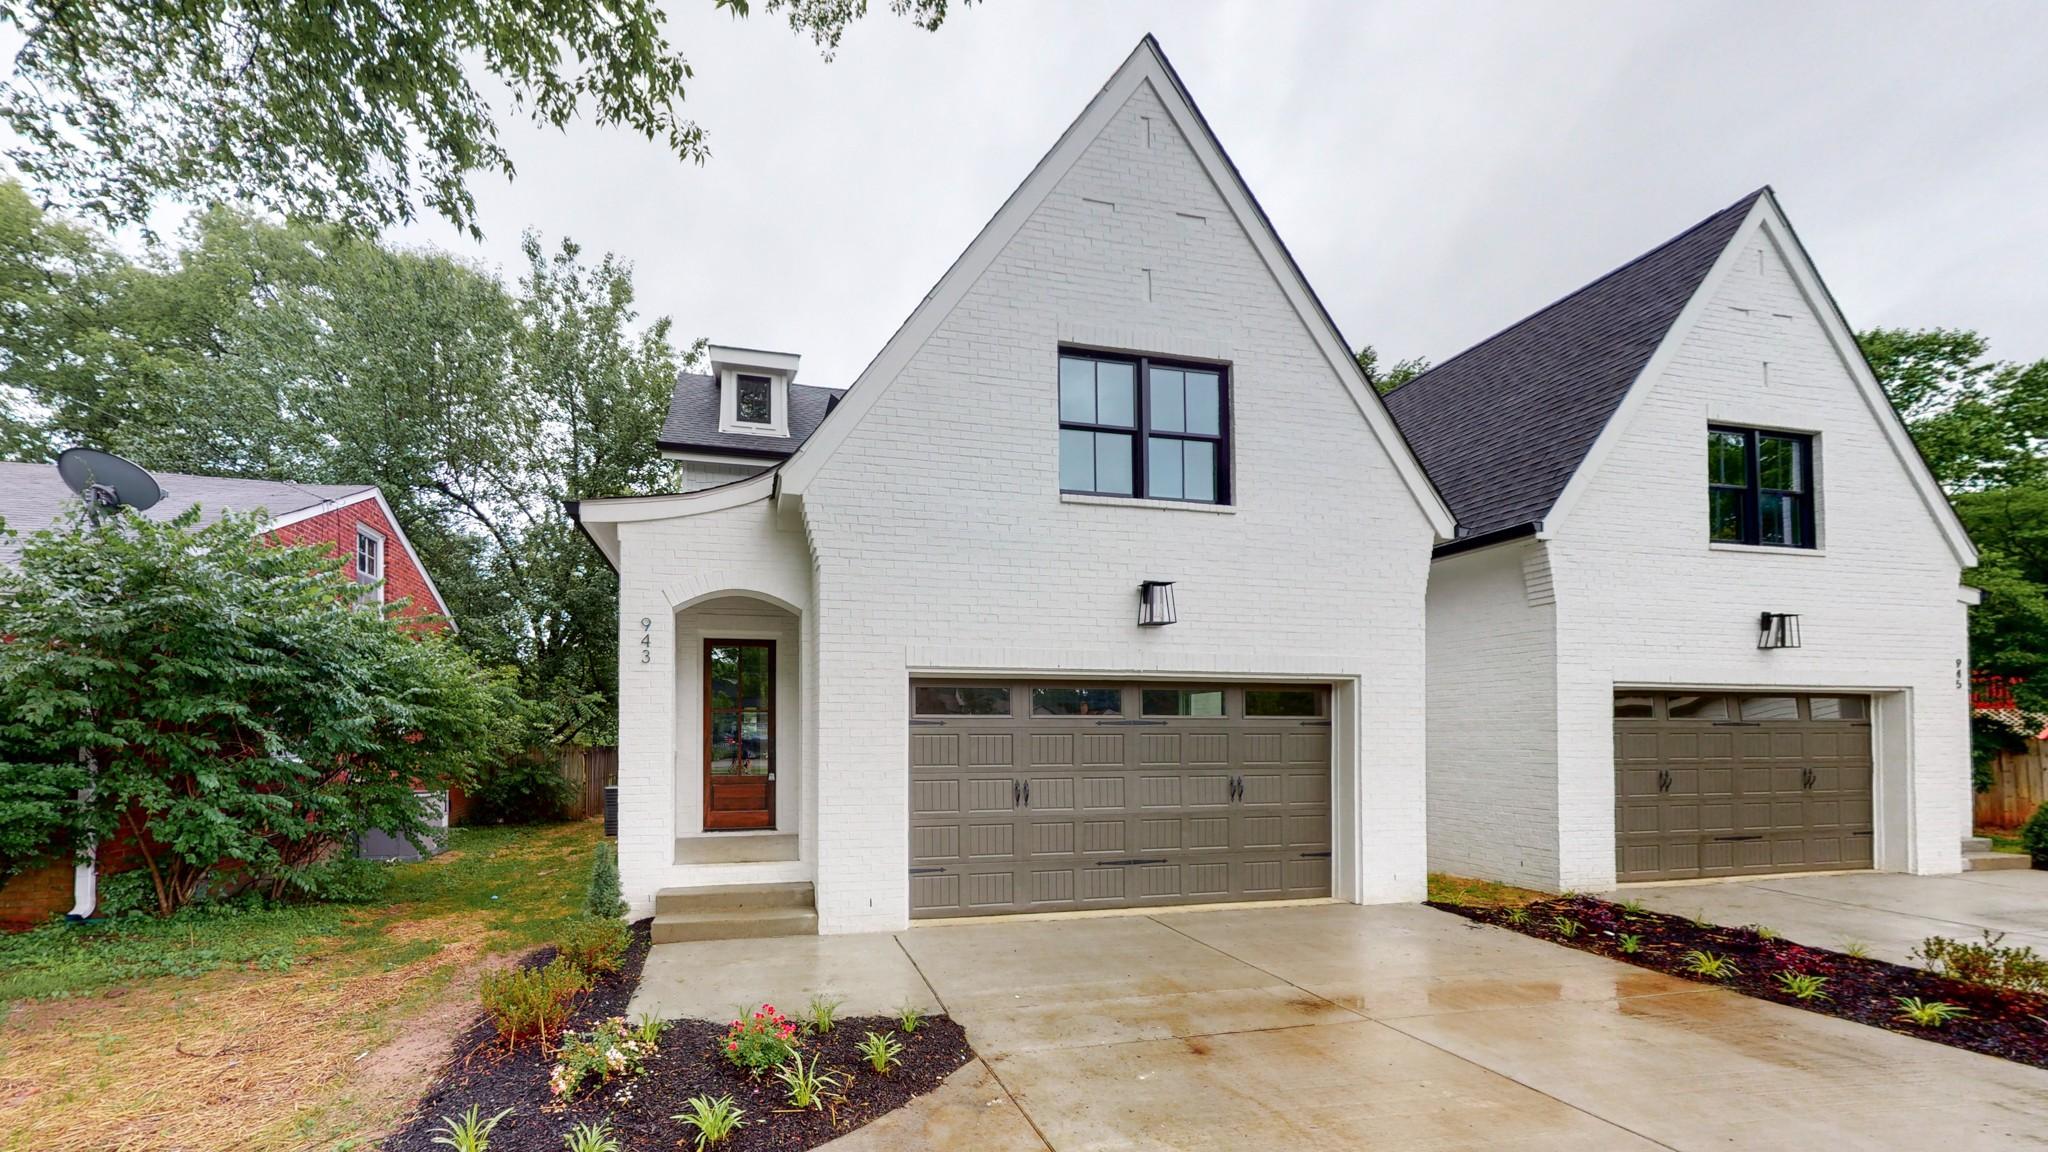 943 Woodmont Blvd Property Photo - Nashville, TN real estate listing